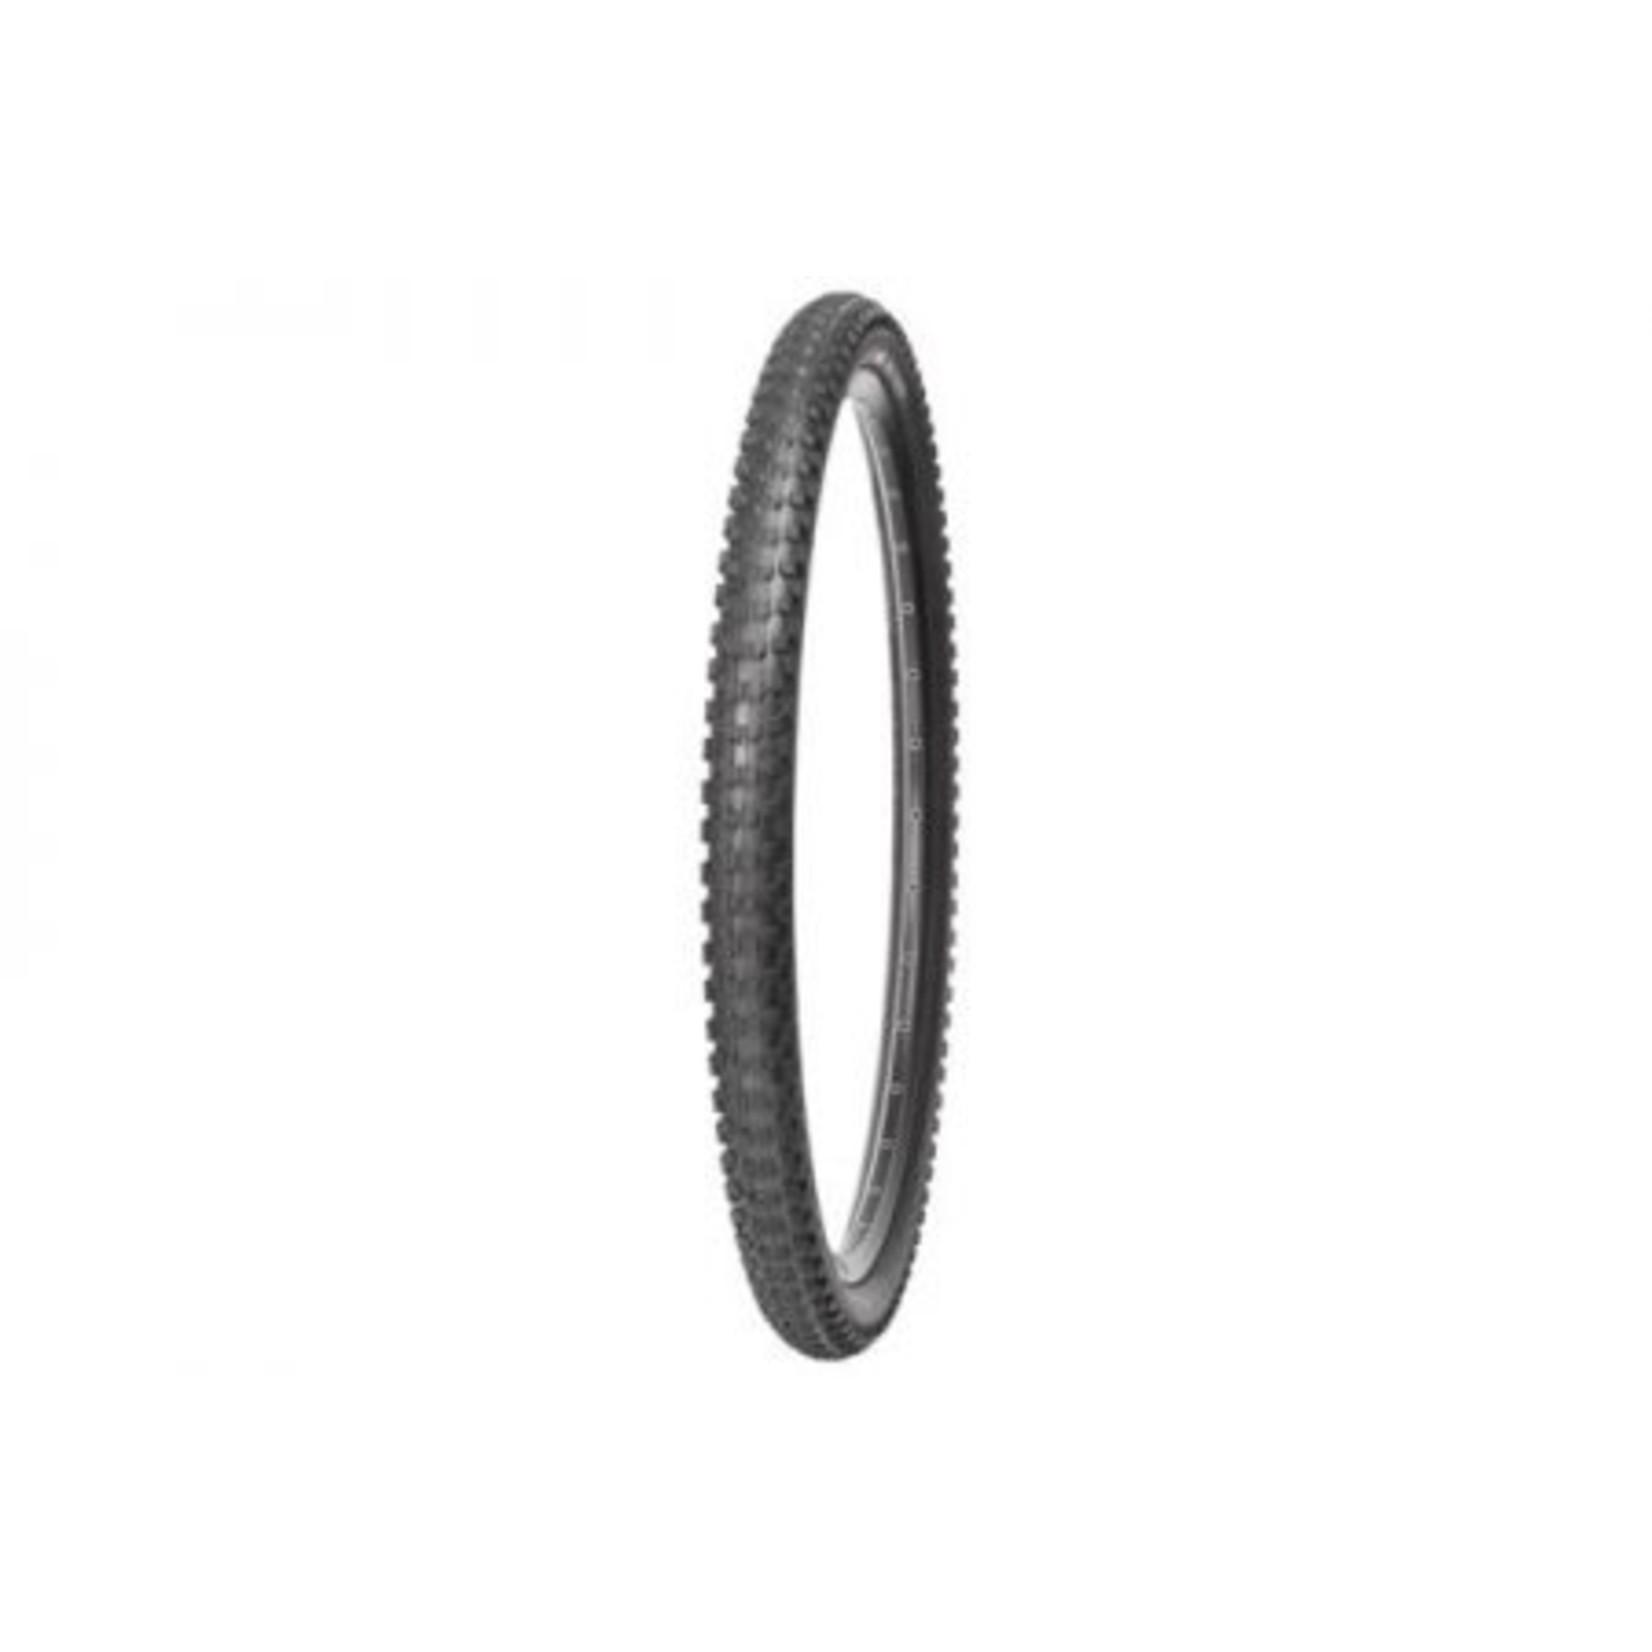 29 x 2.10 Mr. Robsen MTB Tyre - Black